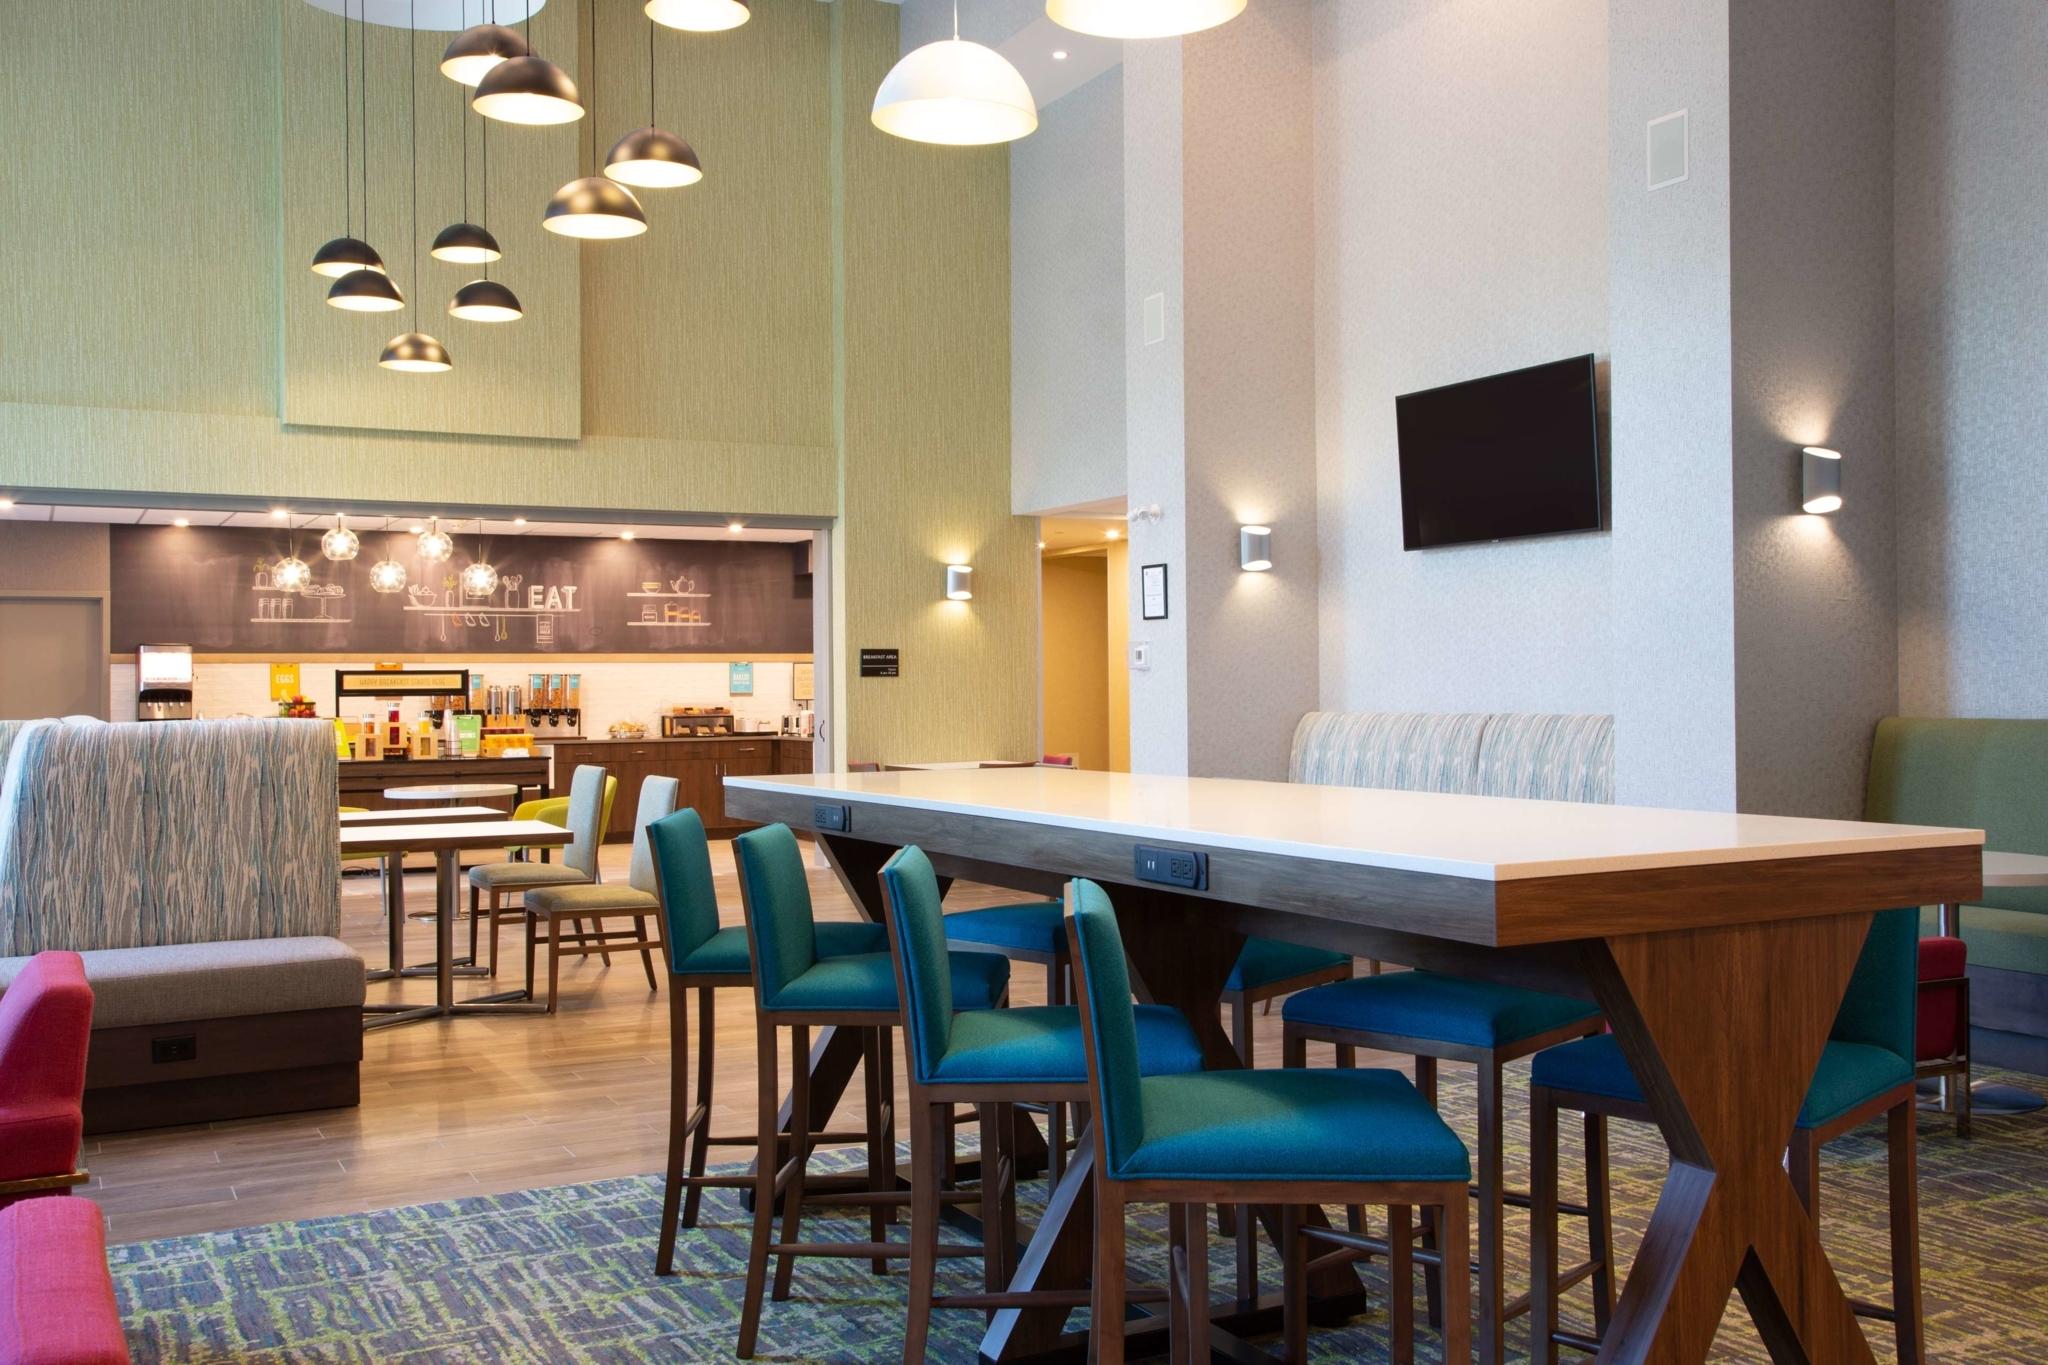 Hampton Inn & Suites by Hilton Edmonton St. Albert - Hotels